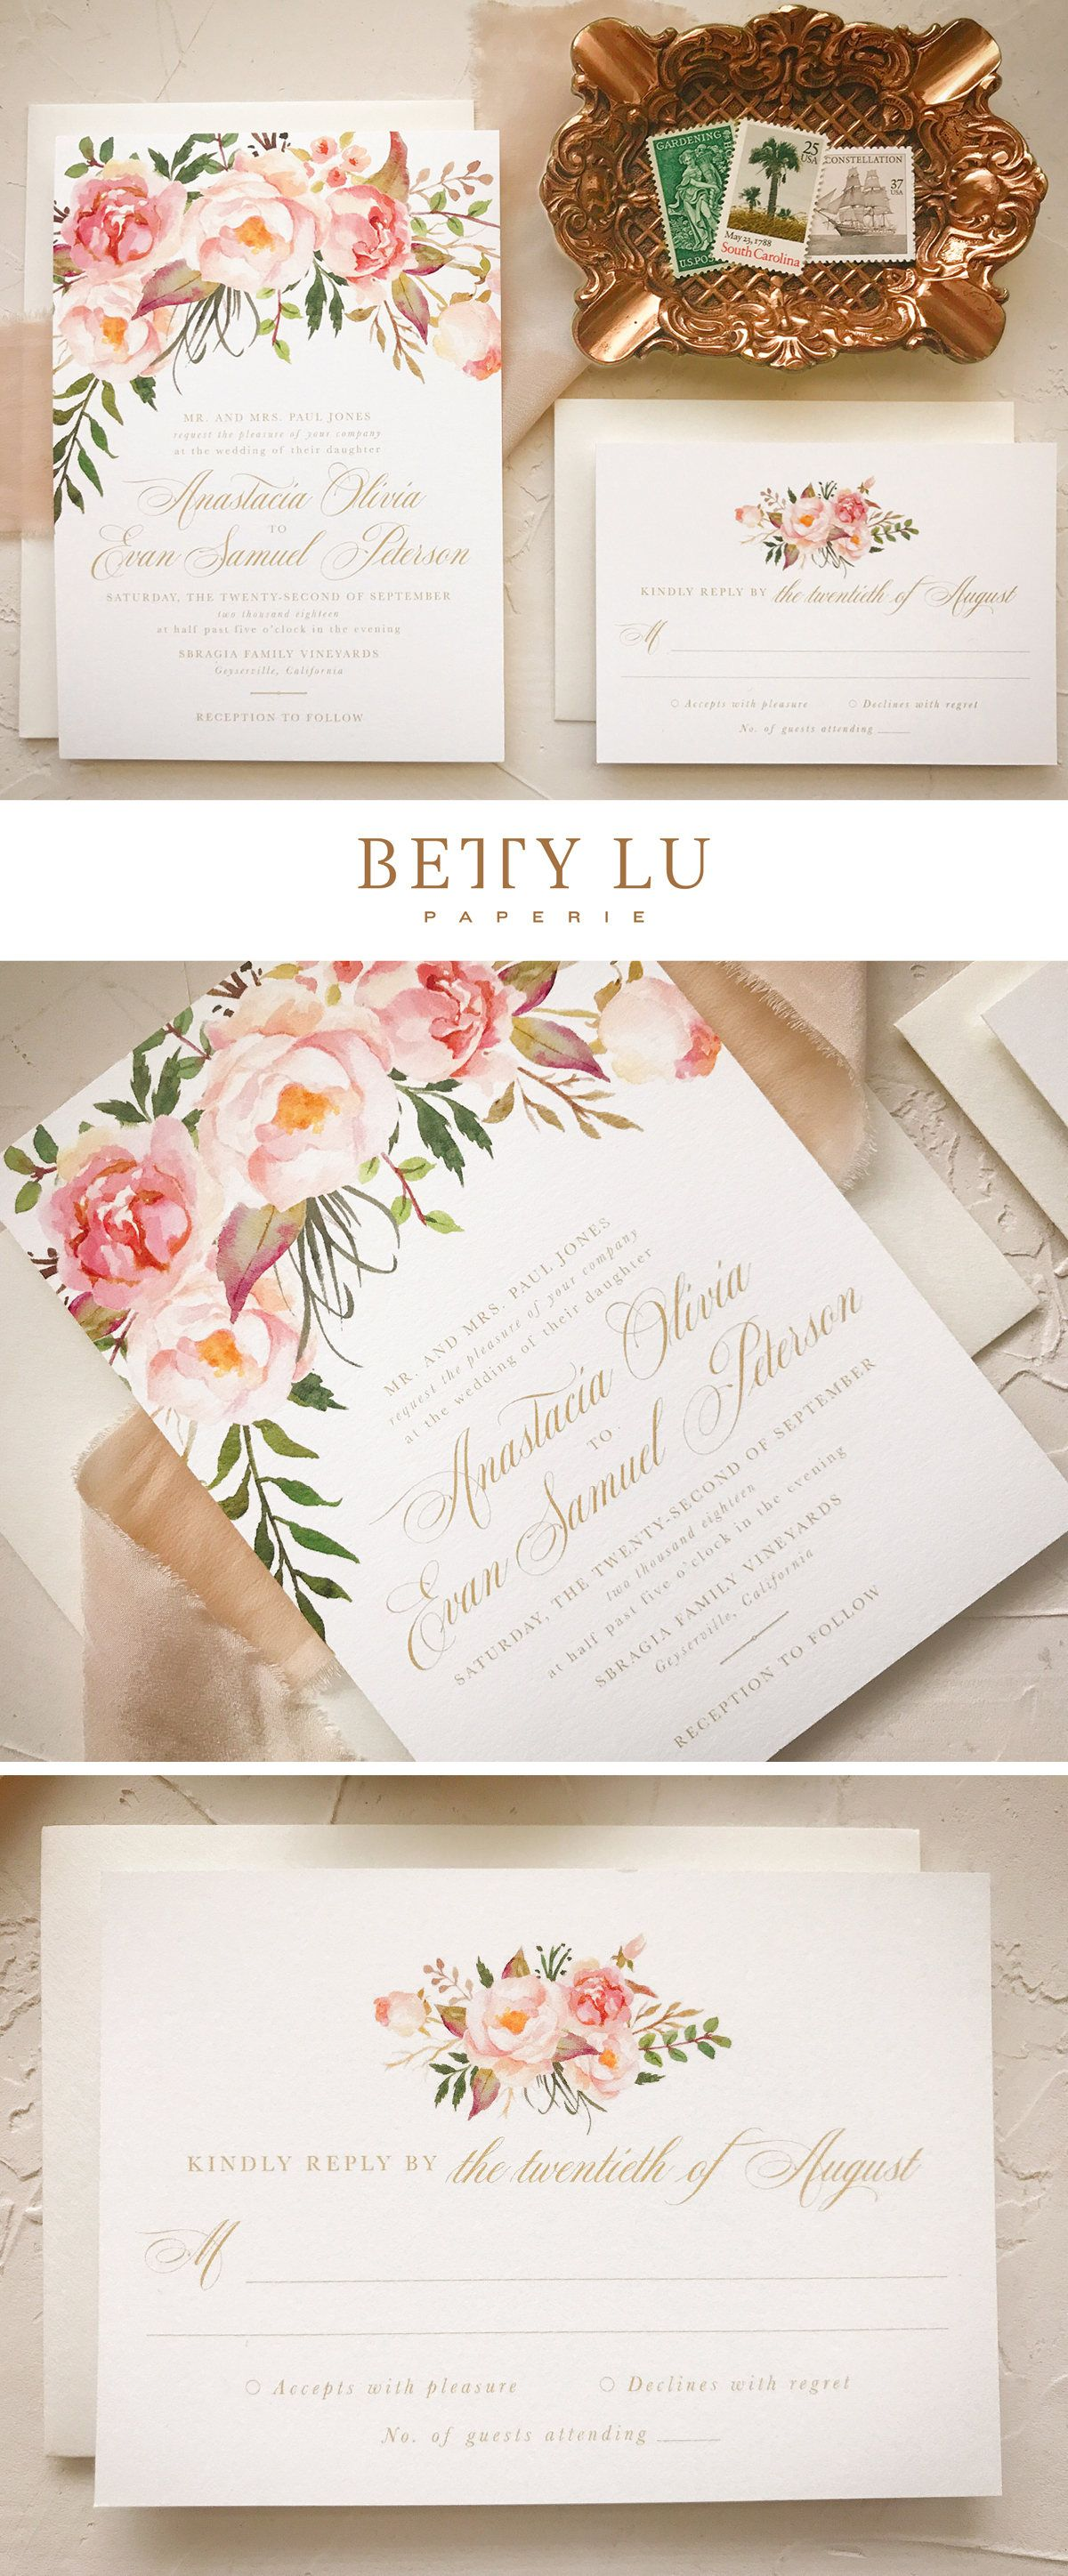 Blush Floral Wedding Invitation, Boho Chic Wedding Invites | Blush ...